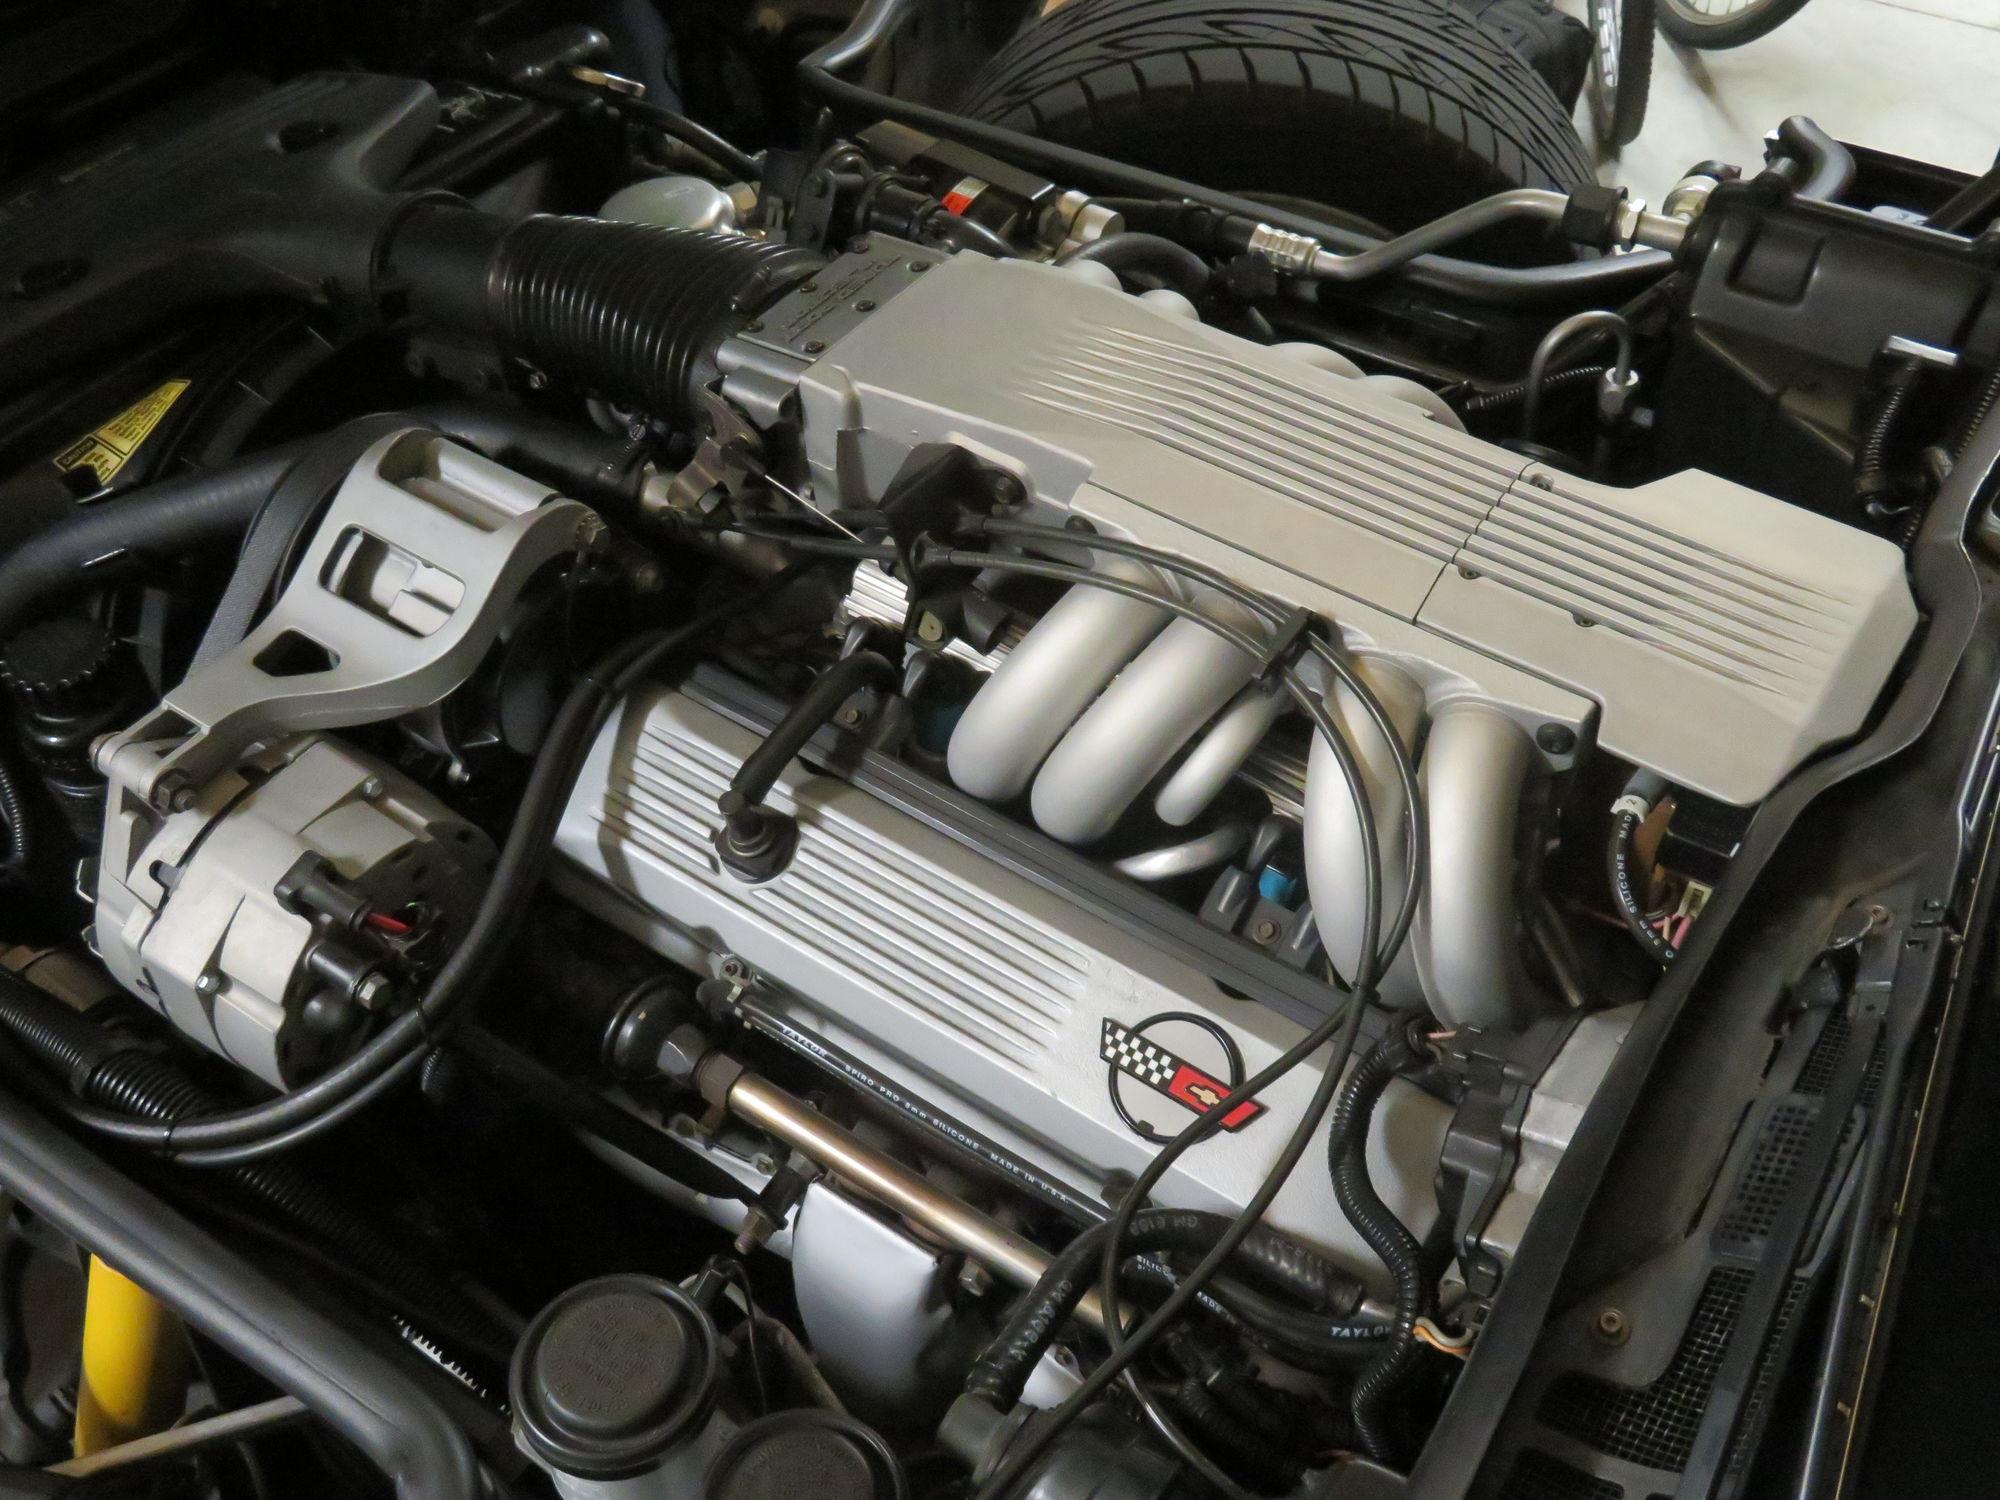 85 Spark plug wire routing - CorvetteForum - Chevrolet Corvette ...